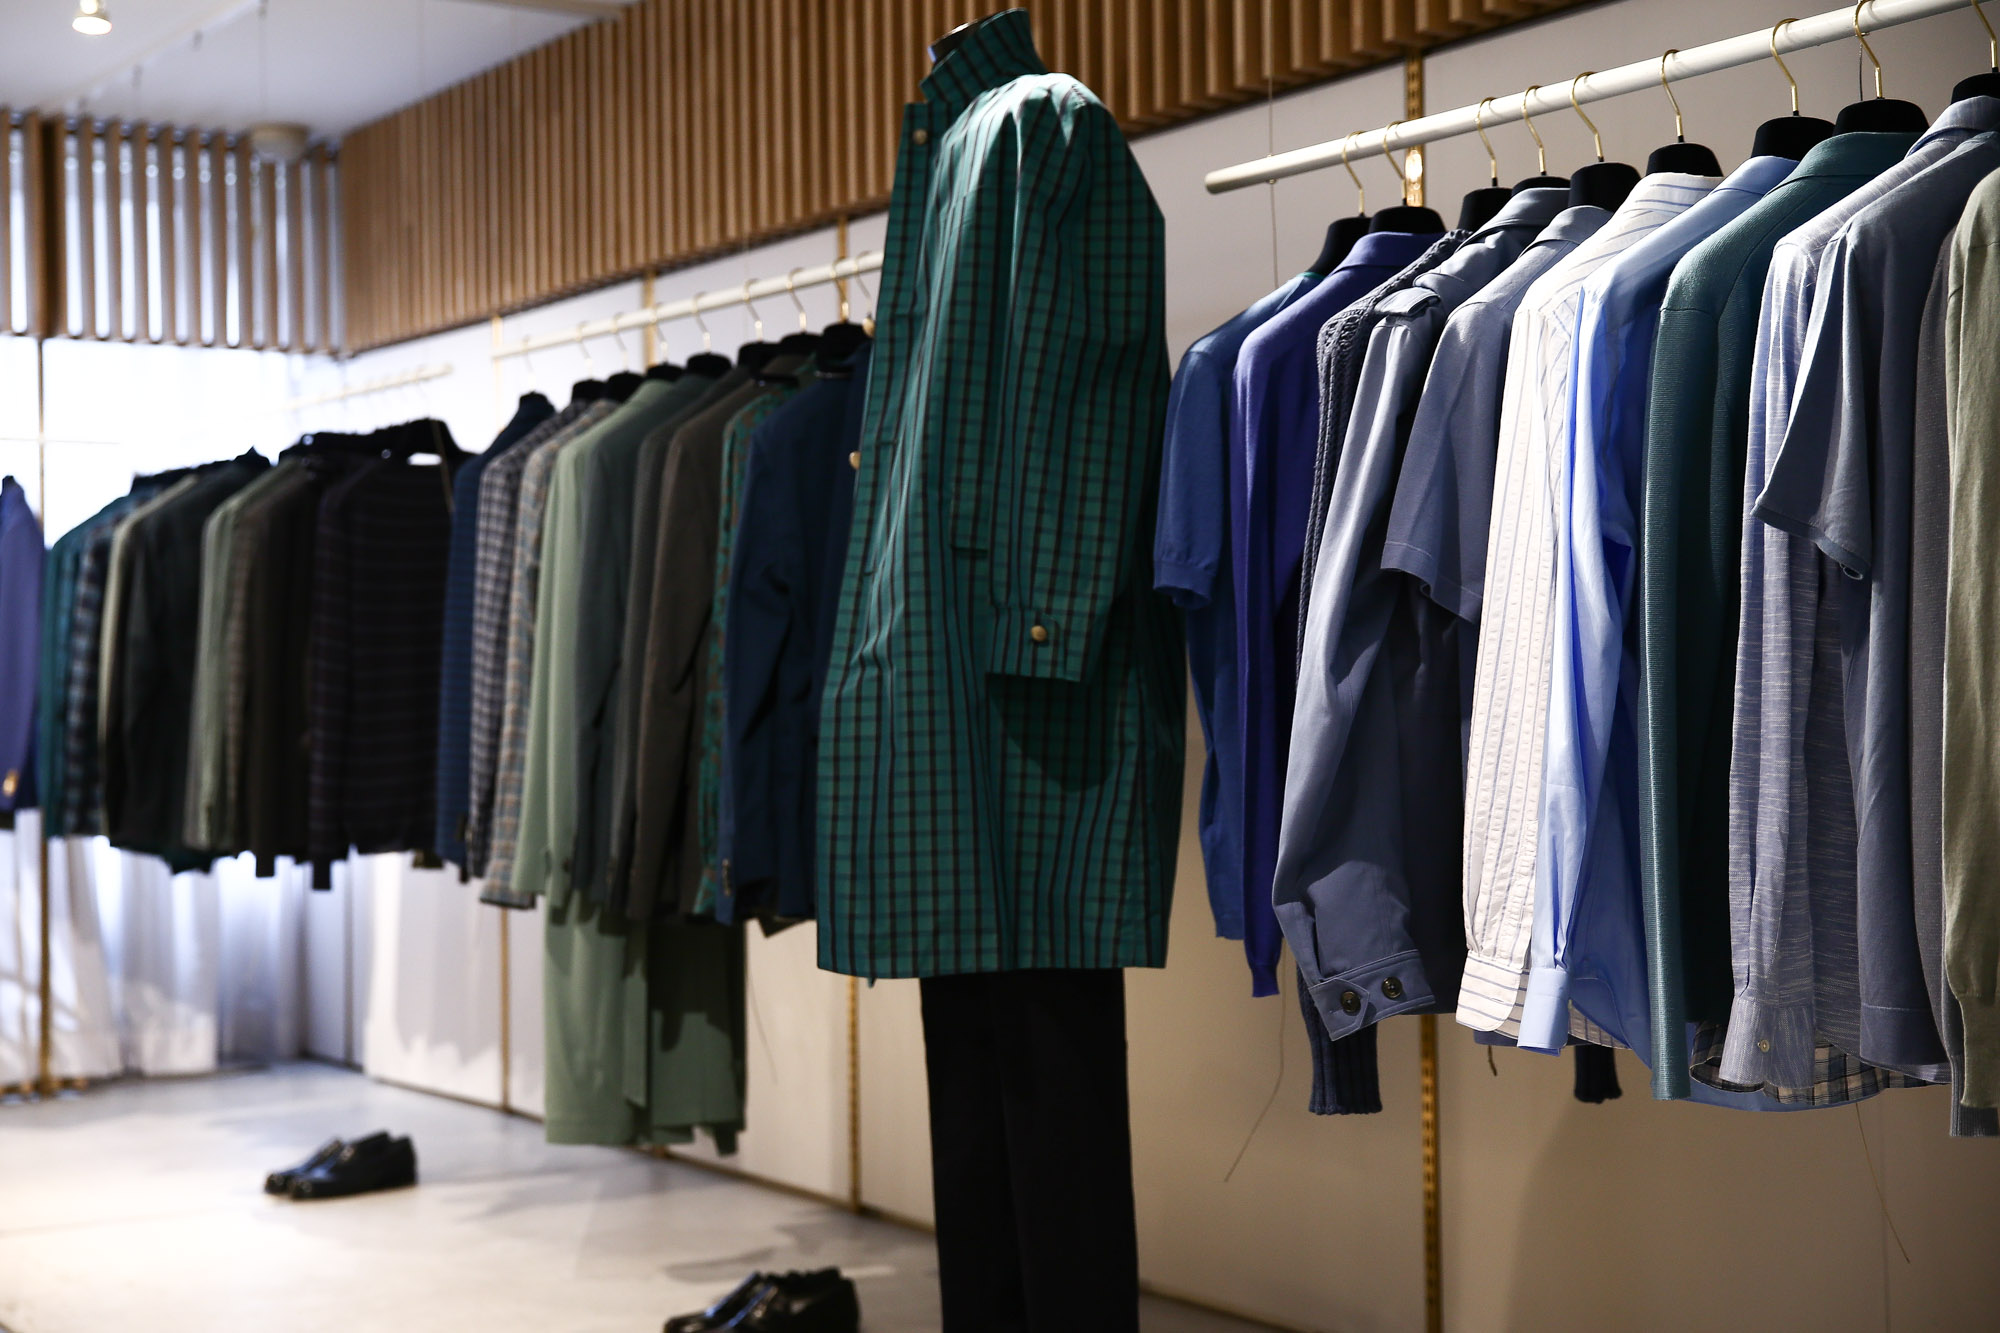 BOGLIOLI ボリオリ MIRANO ミラノ ボリオリミラノ ドーヴァー Kジャケット コートボリオリは、伝統的なサルトリアーレの手法を継承し、 常に革新的な技術と時代を反映させた新しい発想で進化し続けているブランド。2017年春夏 展示会。